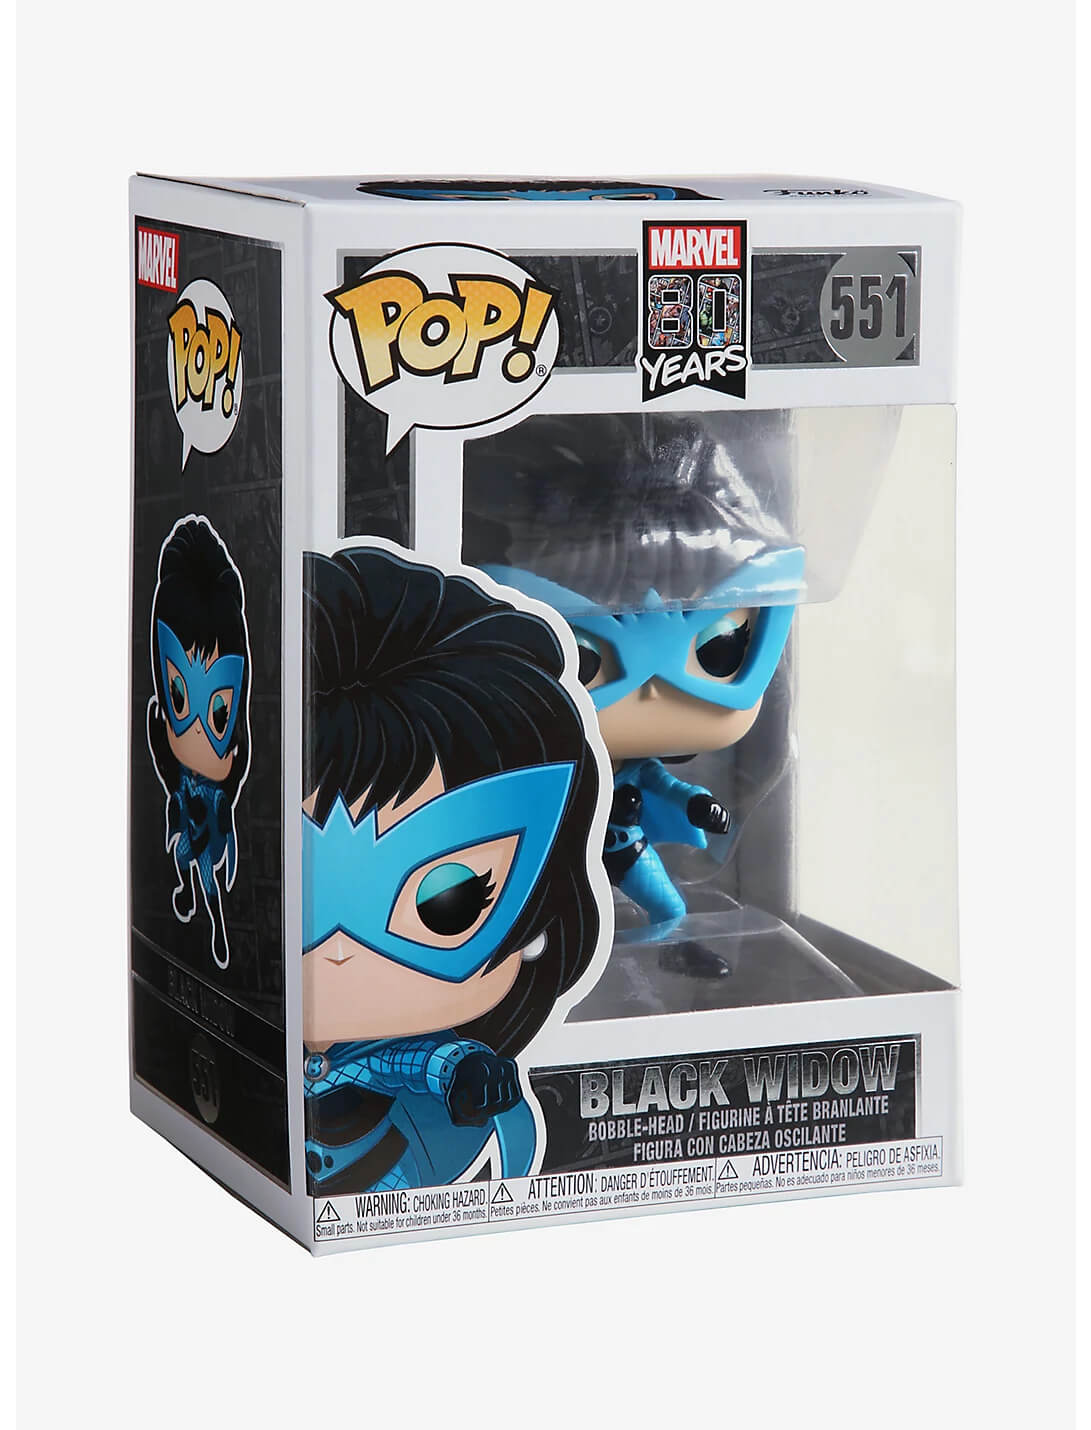 Black Widow #551 (Viúva Negra) - 80 Years - Funko Pop! Marvel